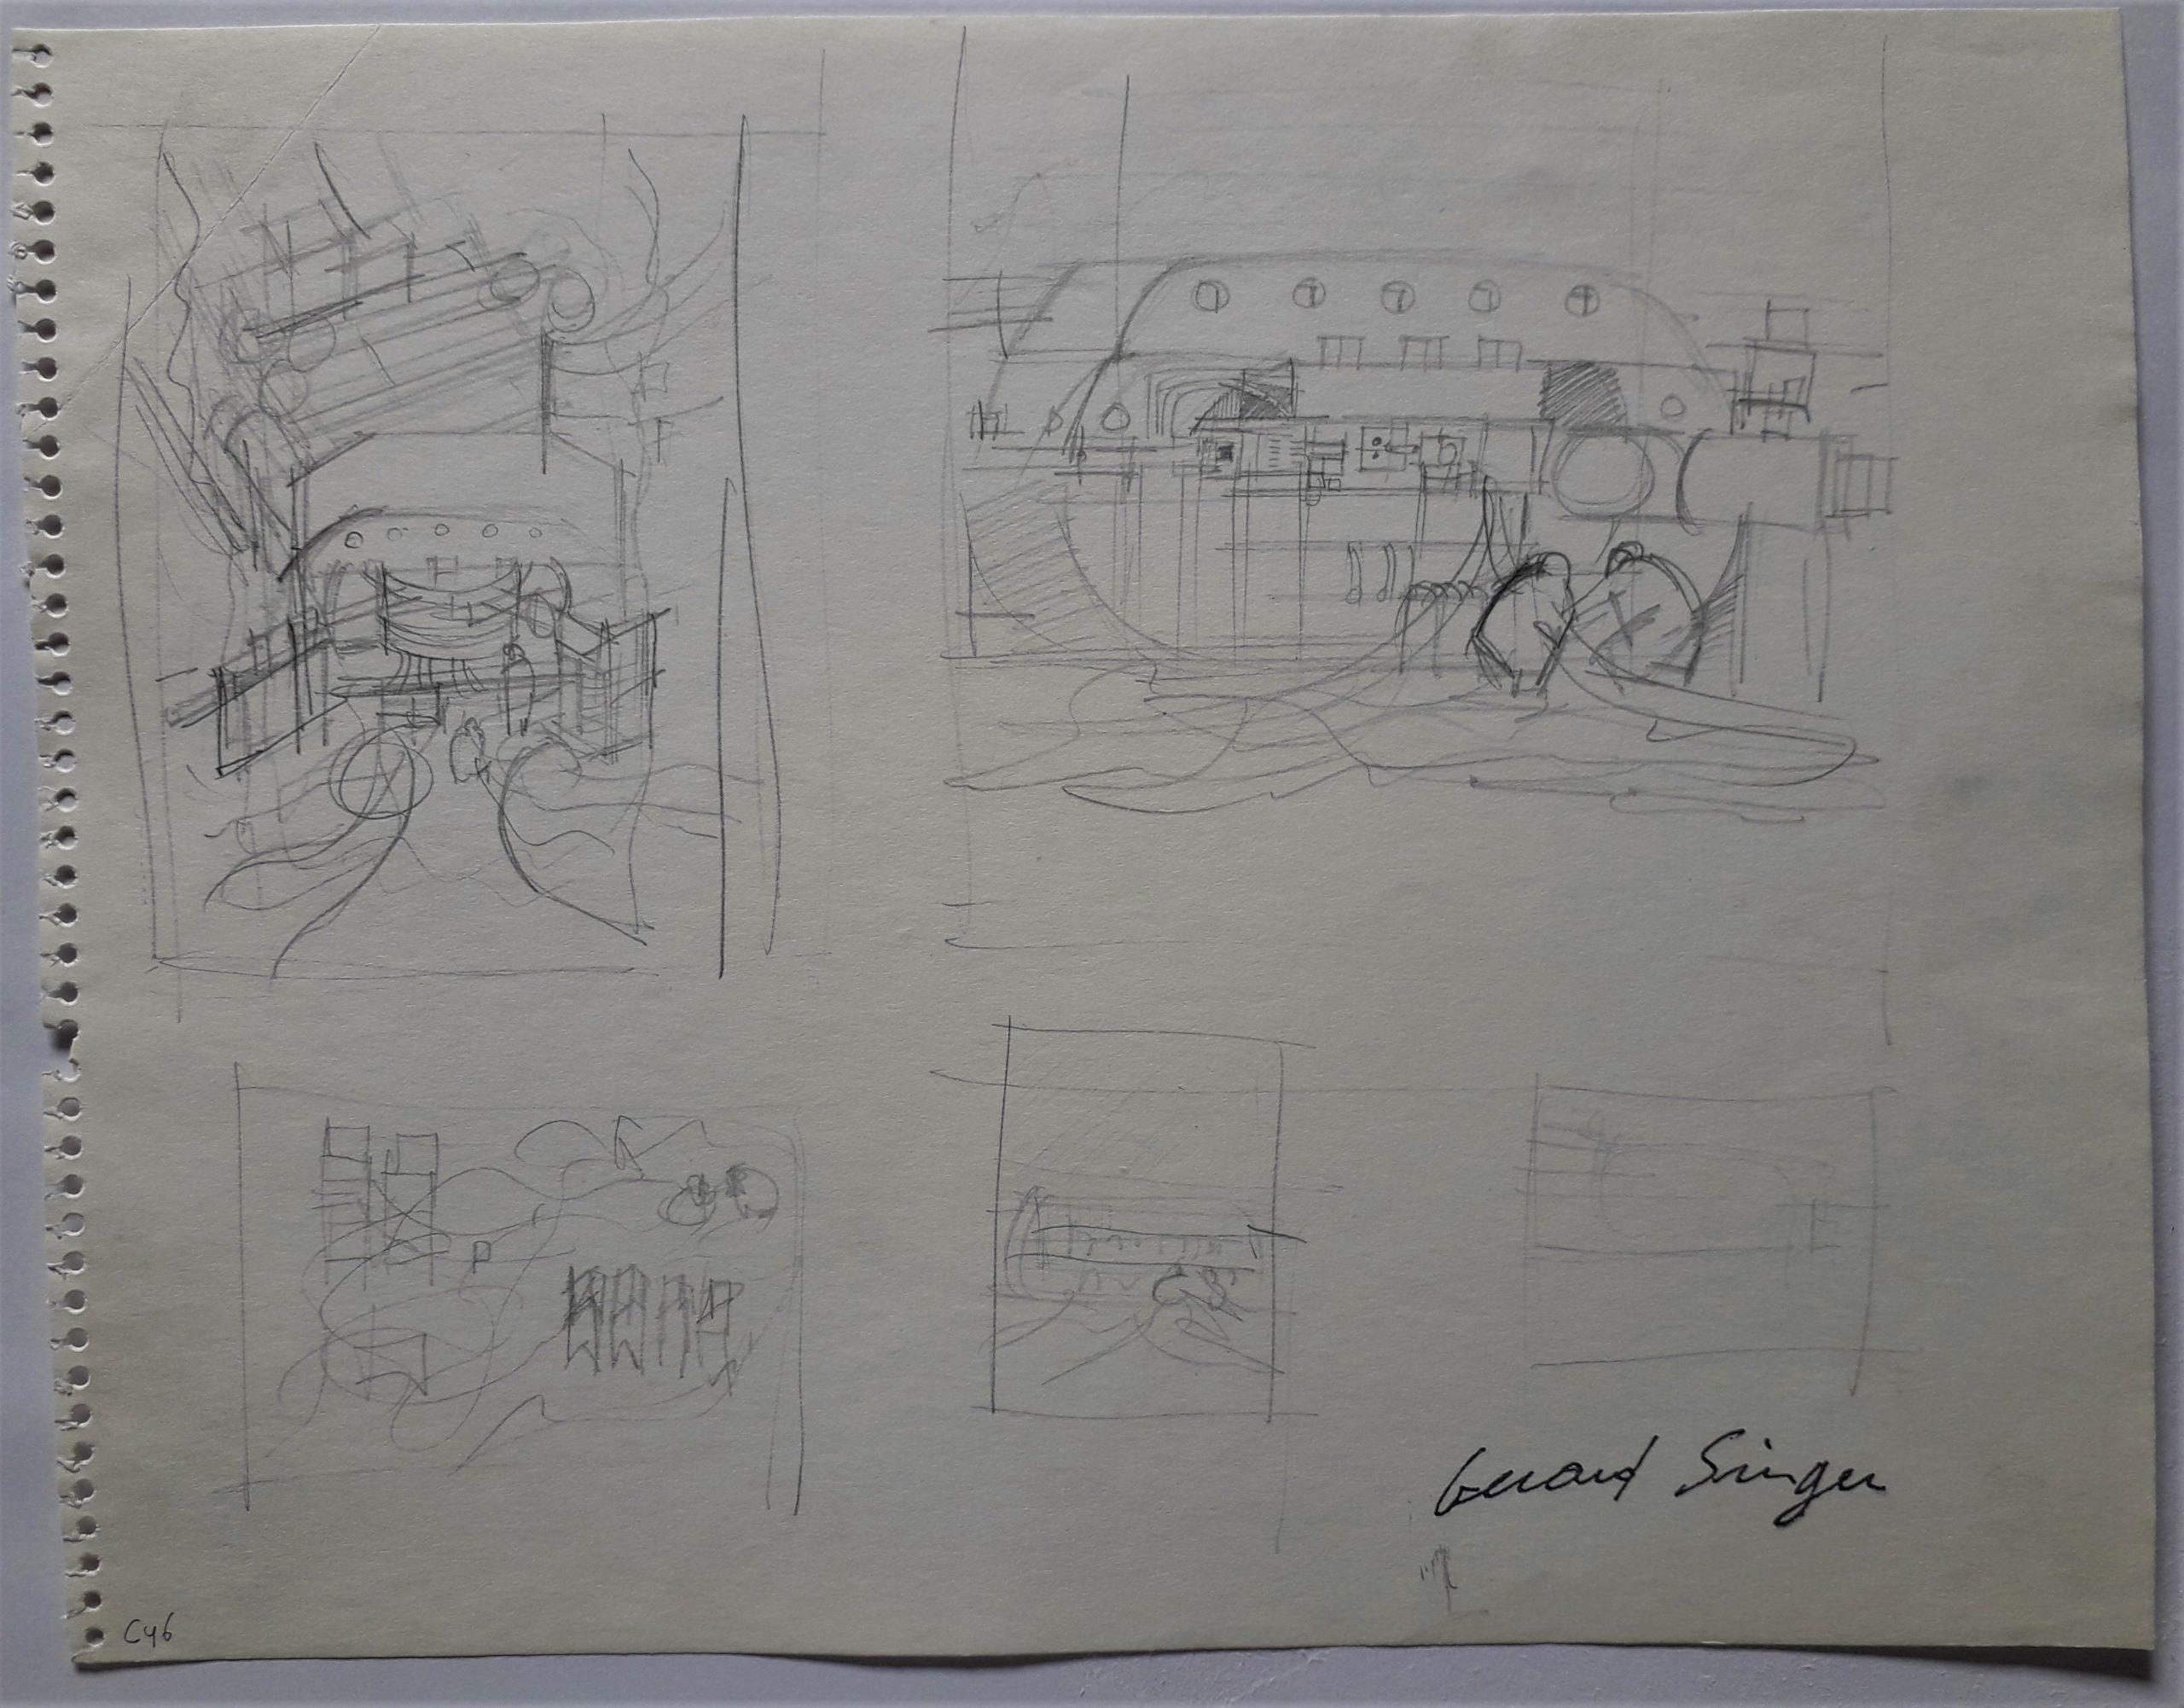 singer-gerard-cyclotron-saclay-cy6